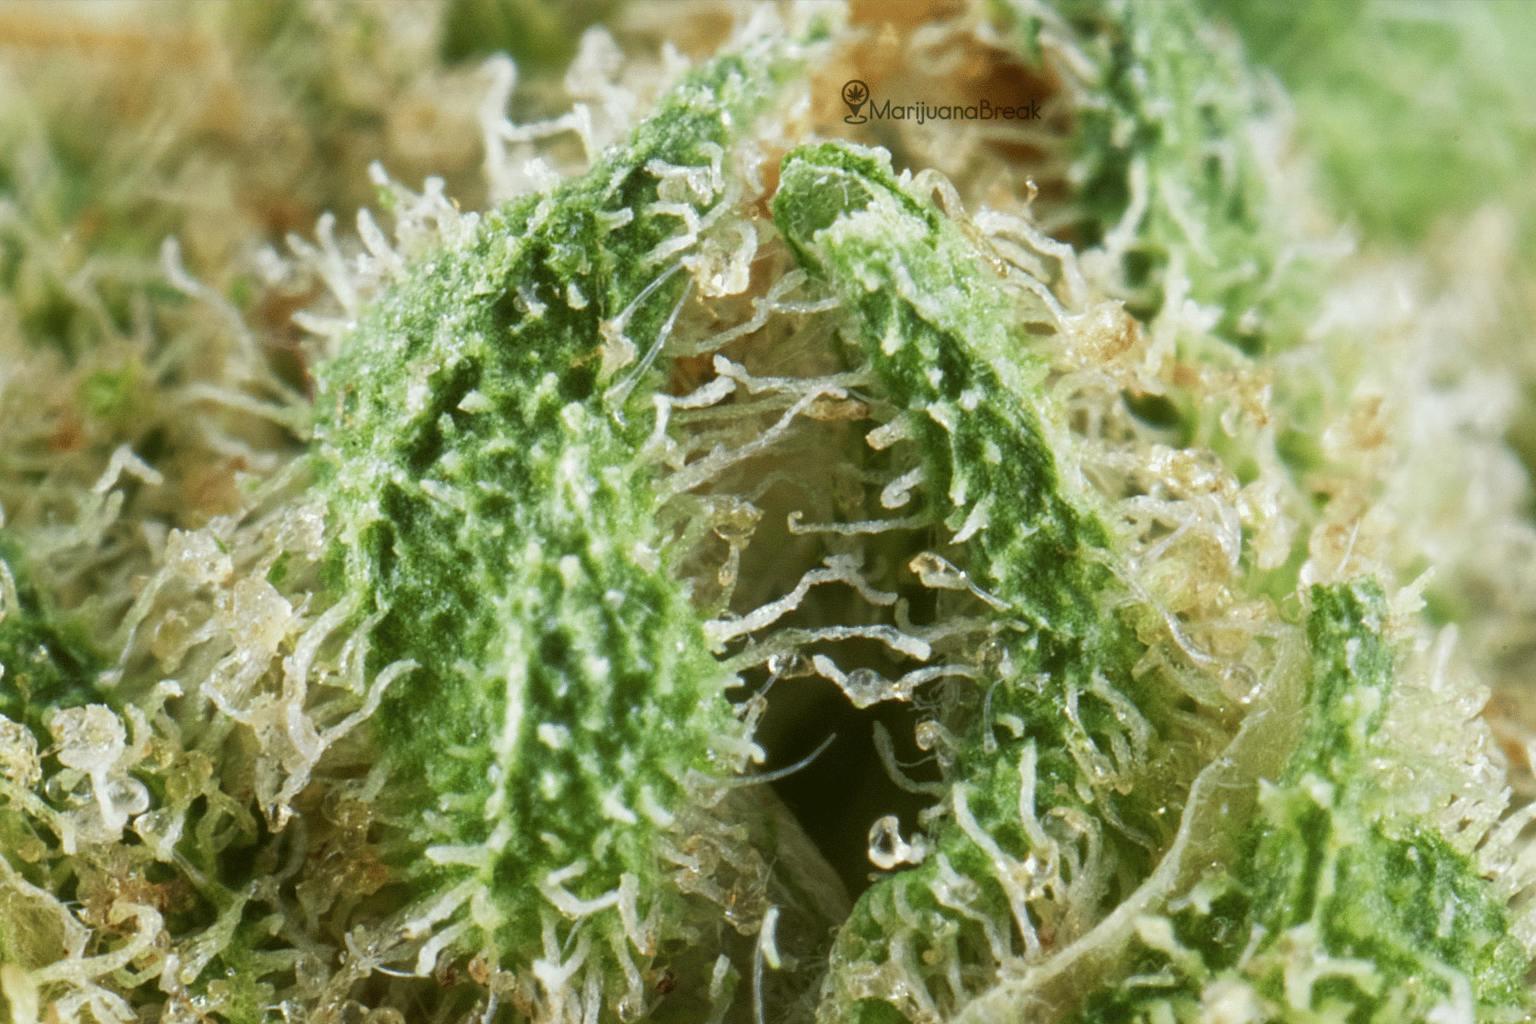 MoonShine Cannabis